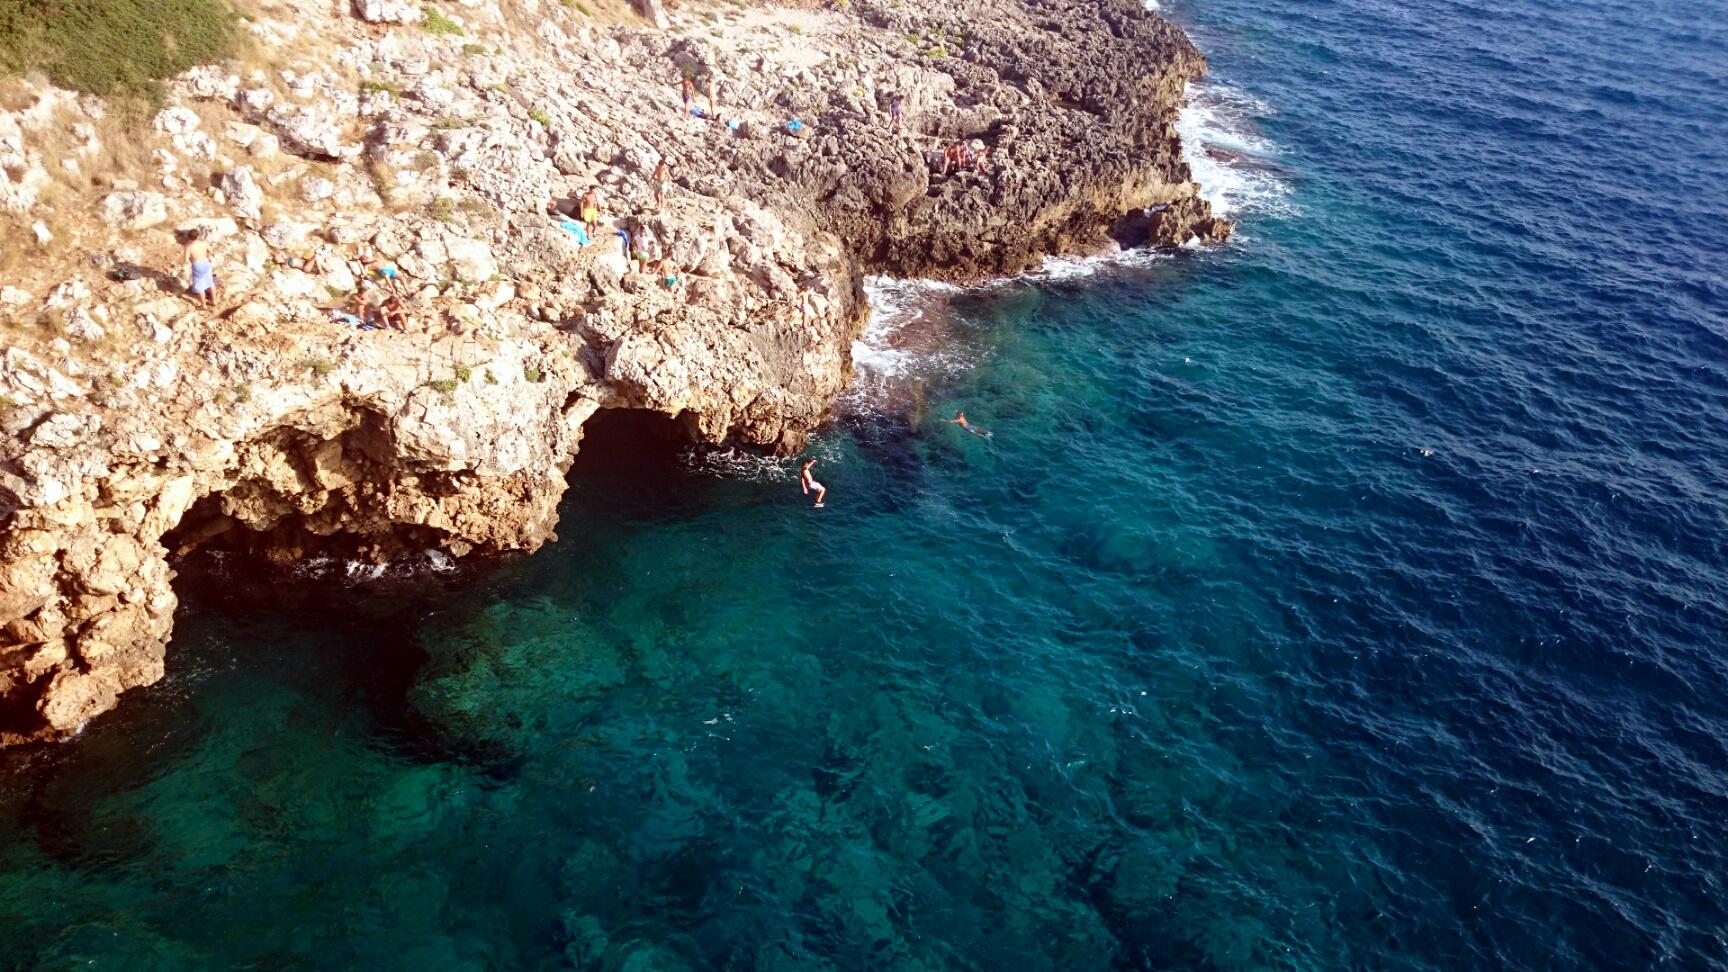 Das blaue Auge des Meeres